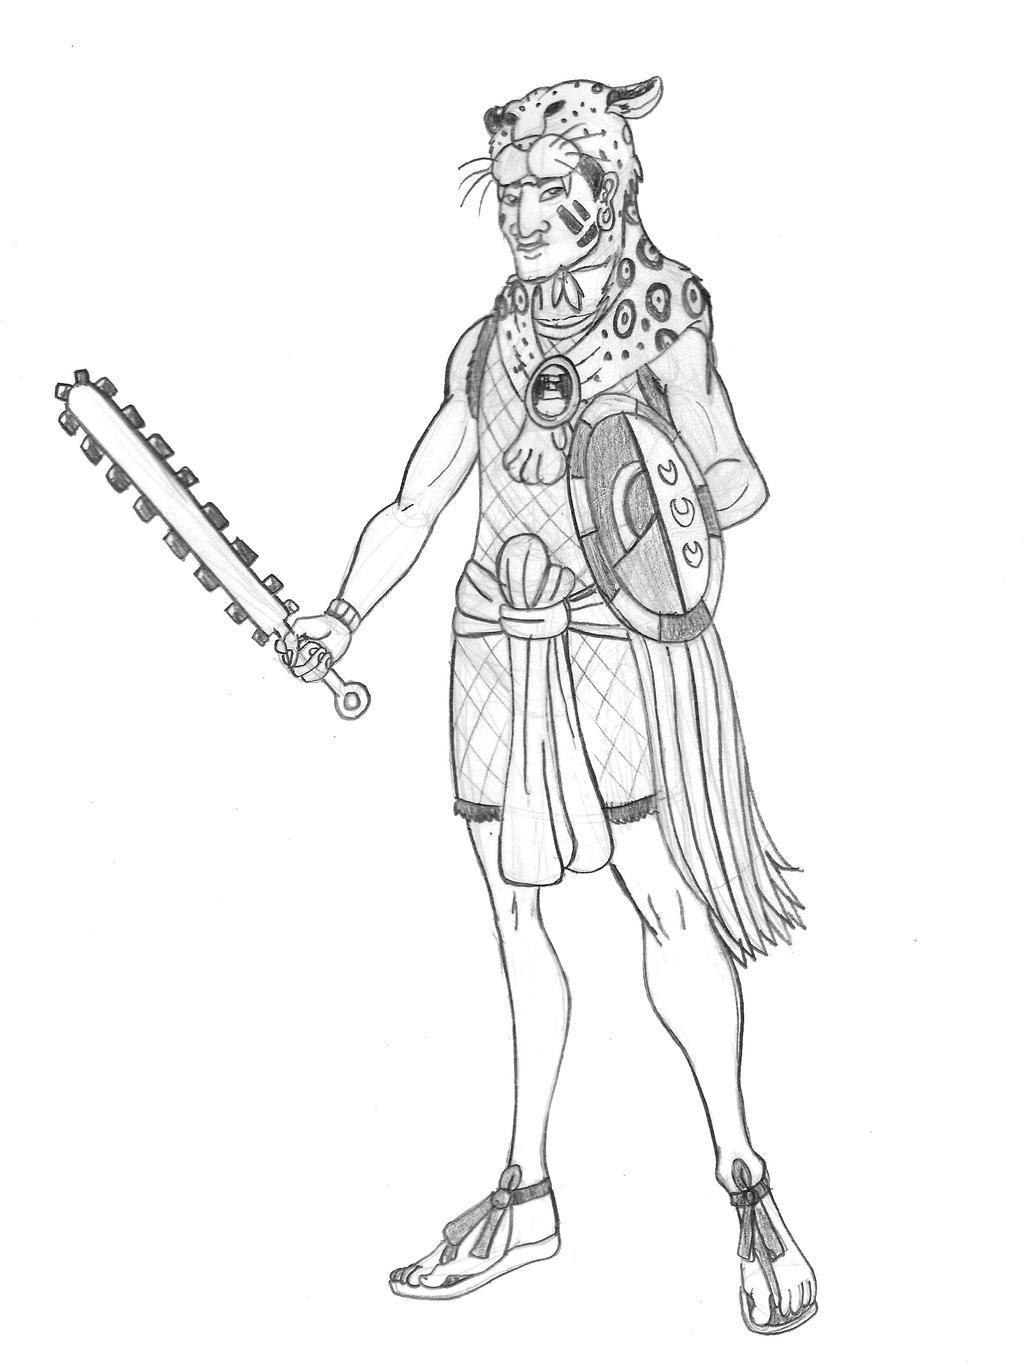 Aztec Jaguar Warrior Sketch By Tyrannoninja On Deviantart